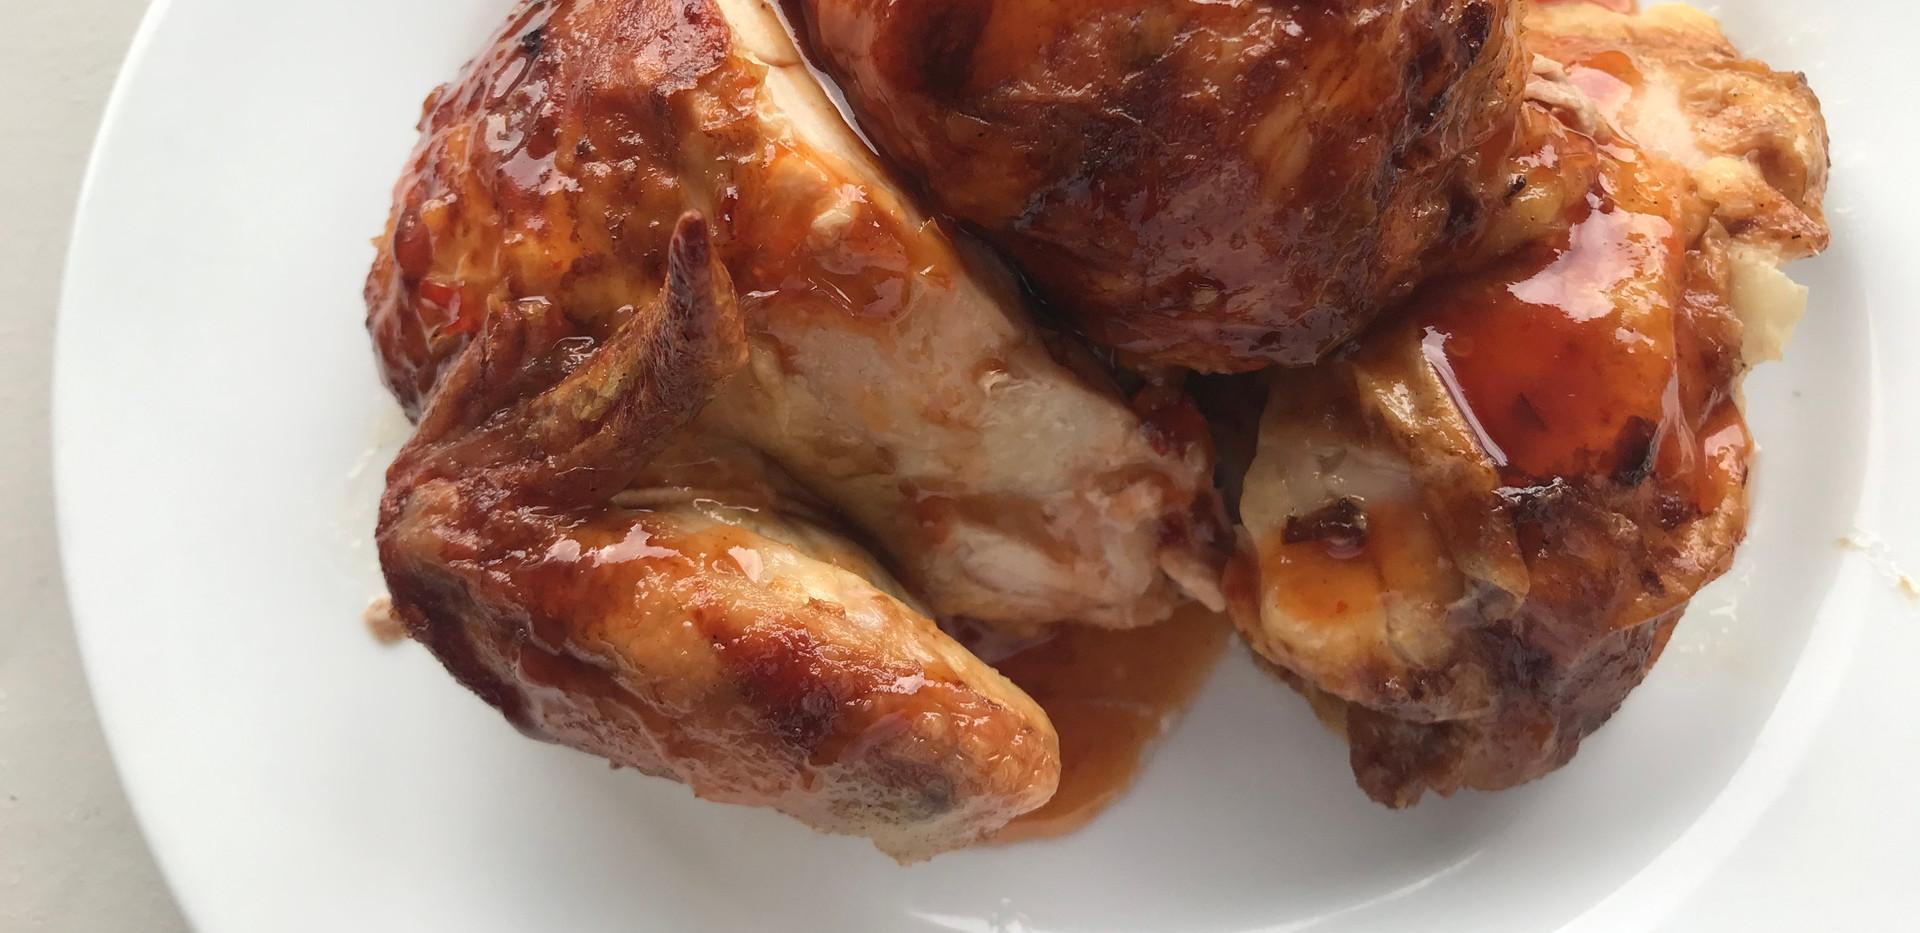 1_2 Fire Roasted Chicken Cut Up.jpg